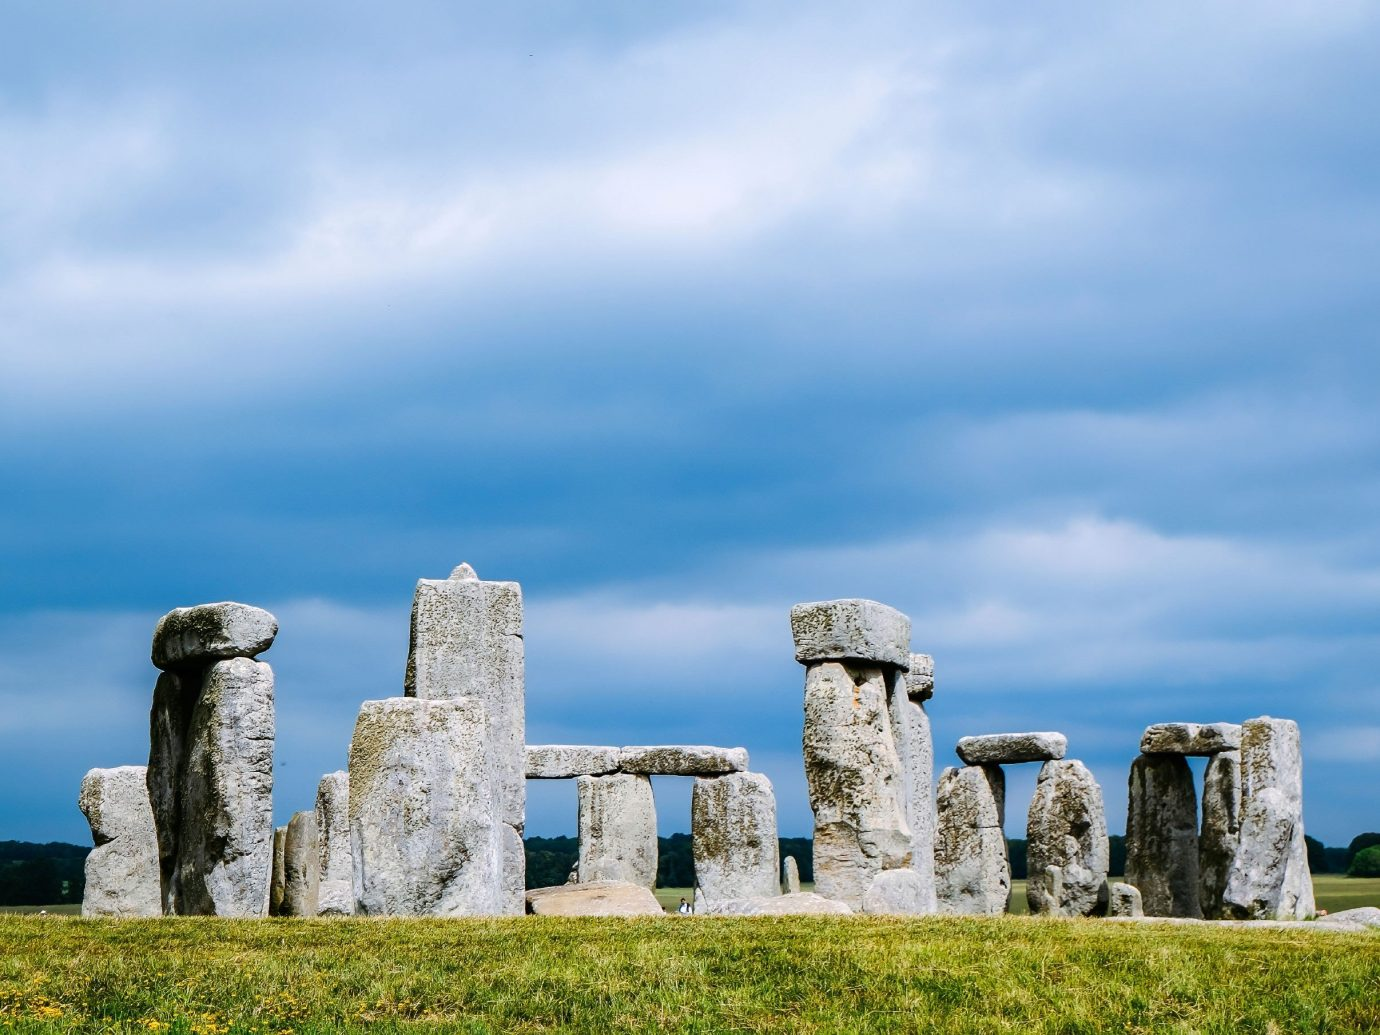 Trip Ideas grass building sky outdoor landmark megalith Ruins stone rock ancient history landscape park Sea Coast castle cement